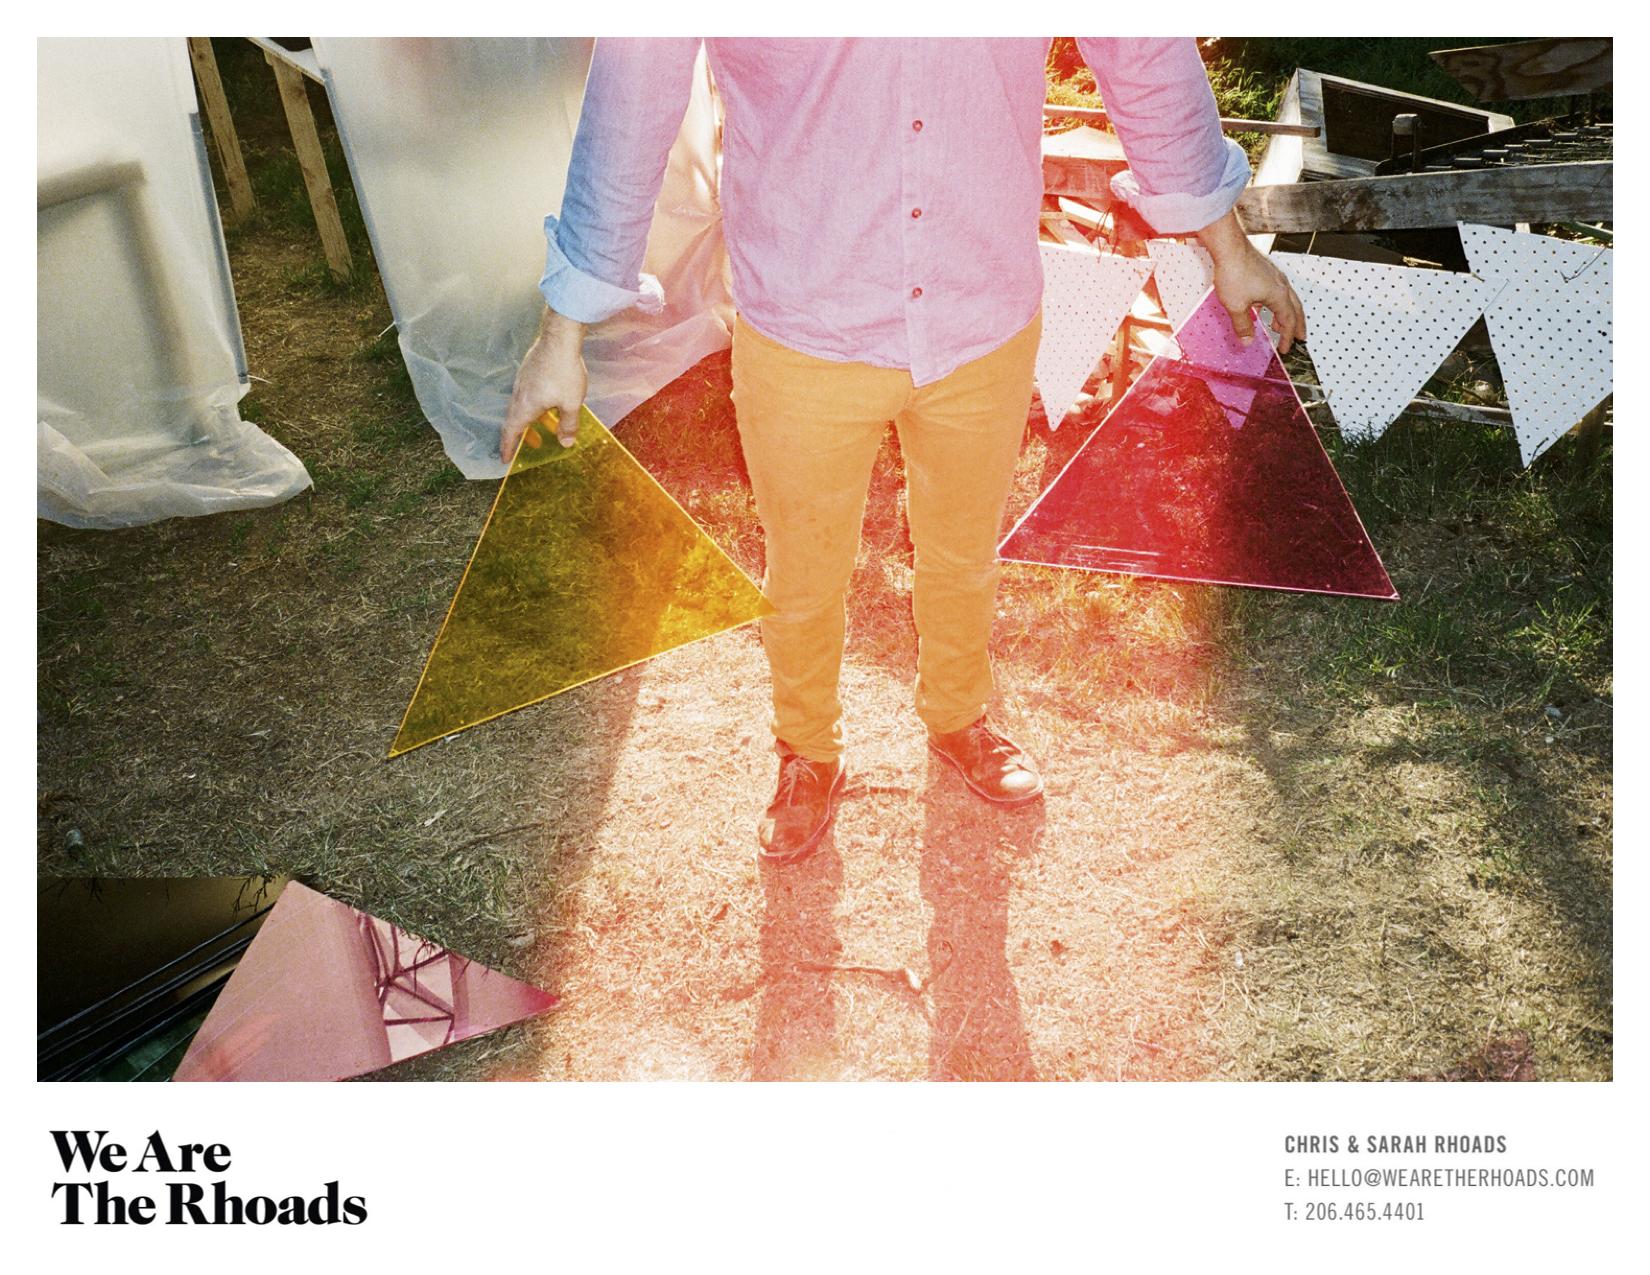 Photo: We are the Rhoads